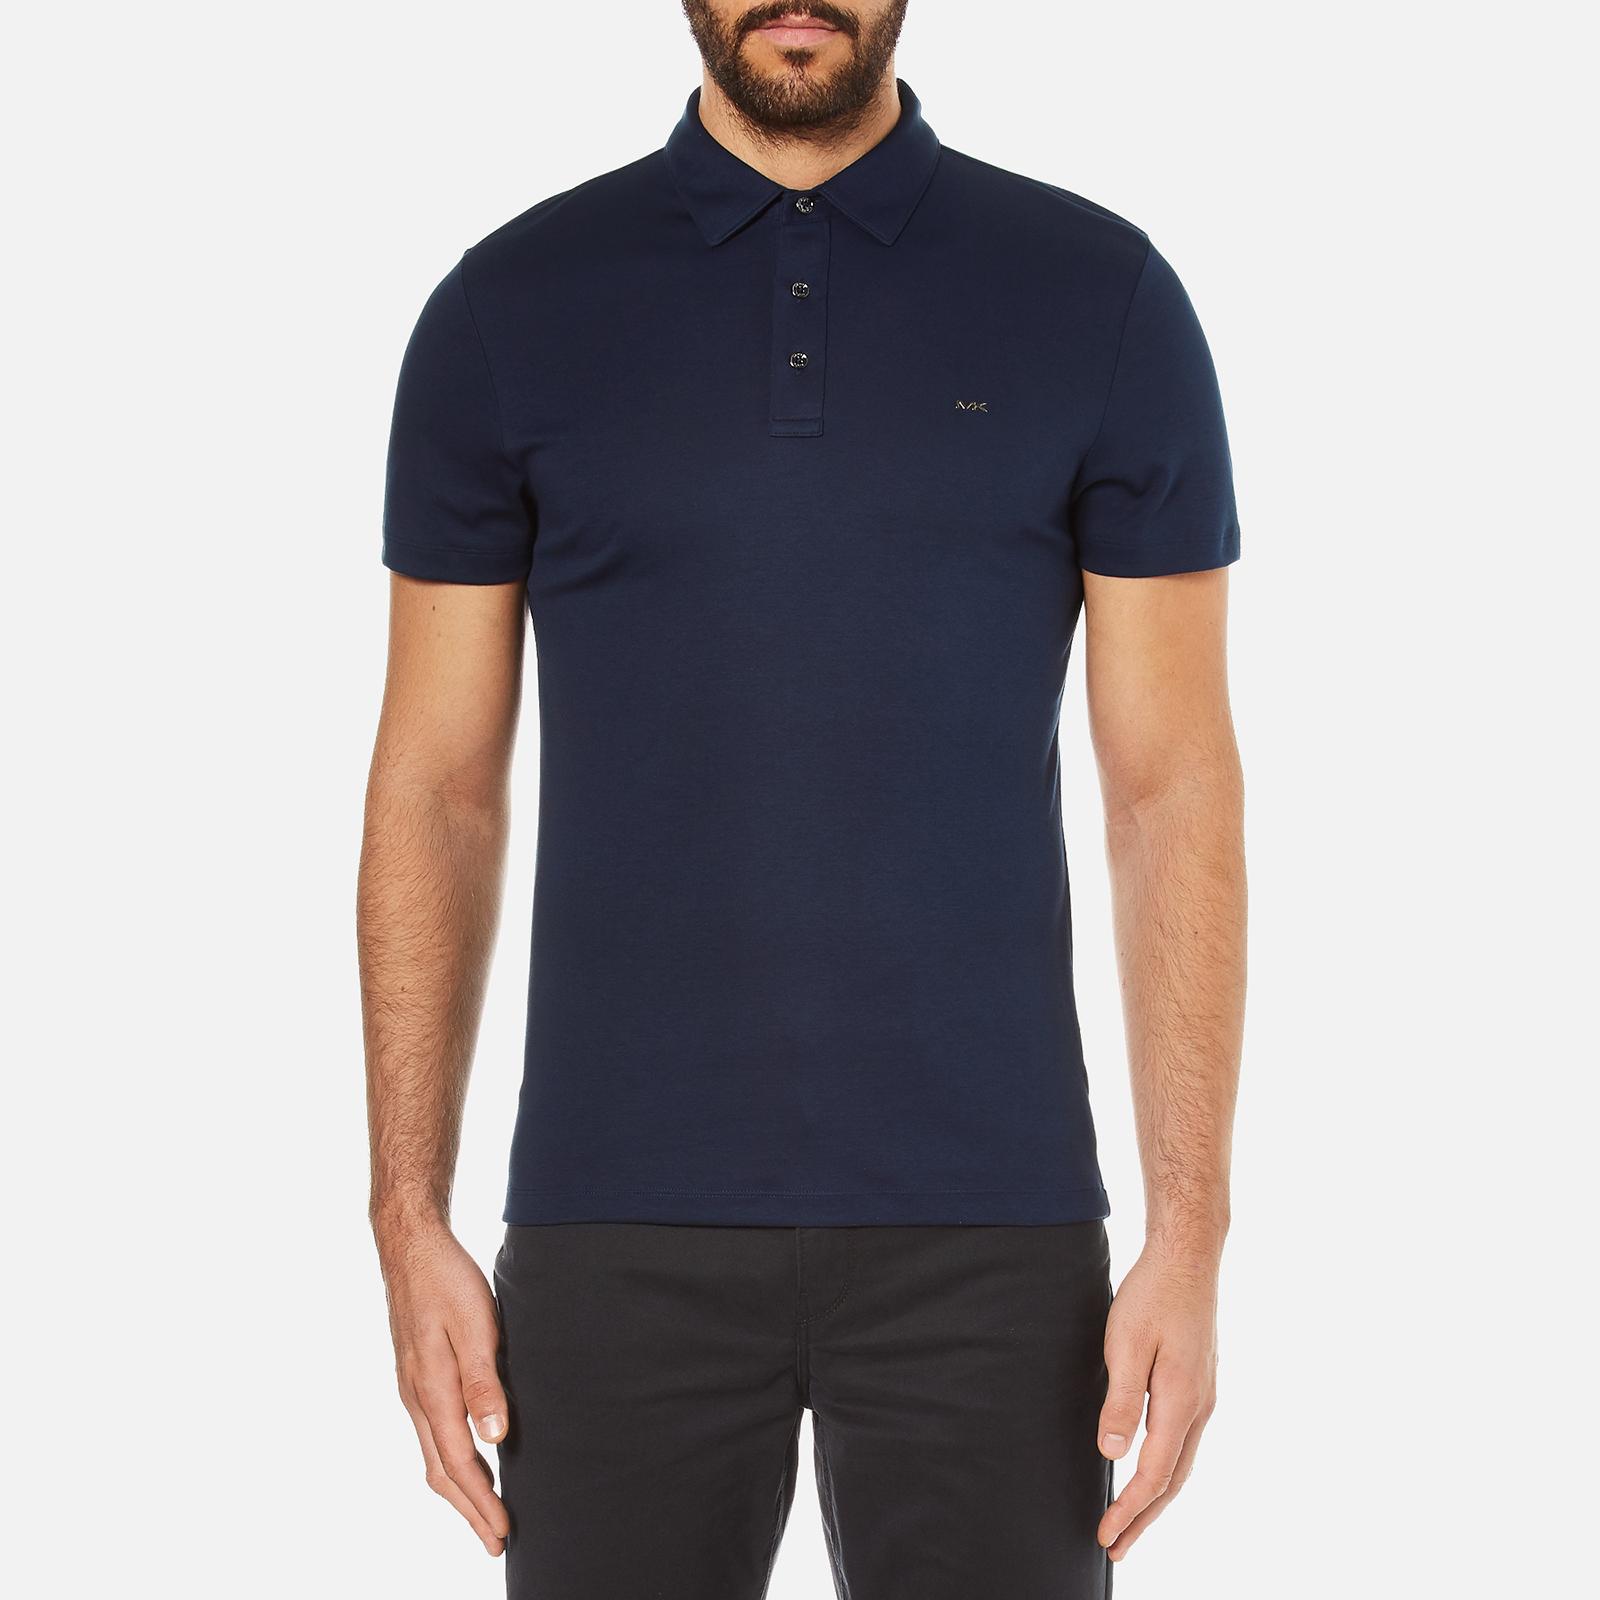 cd2011b10 Michael Kors Men s Liquid Cotton Short Sleeve Polo Shirt - Midnight - Free  UK Delivery over £50